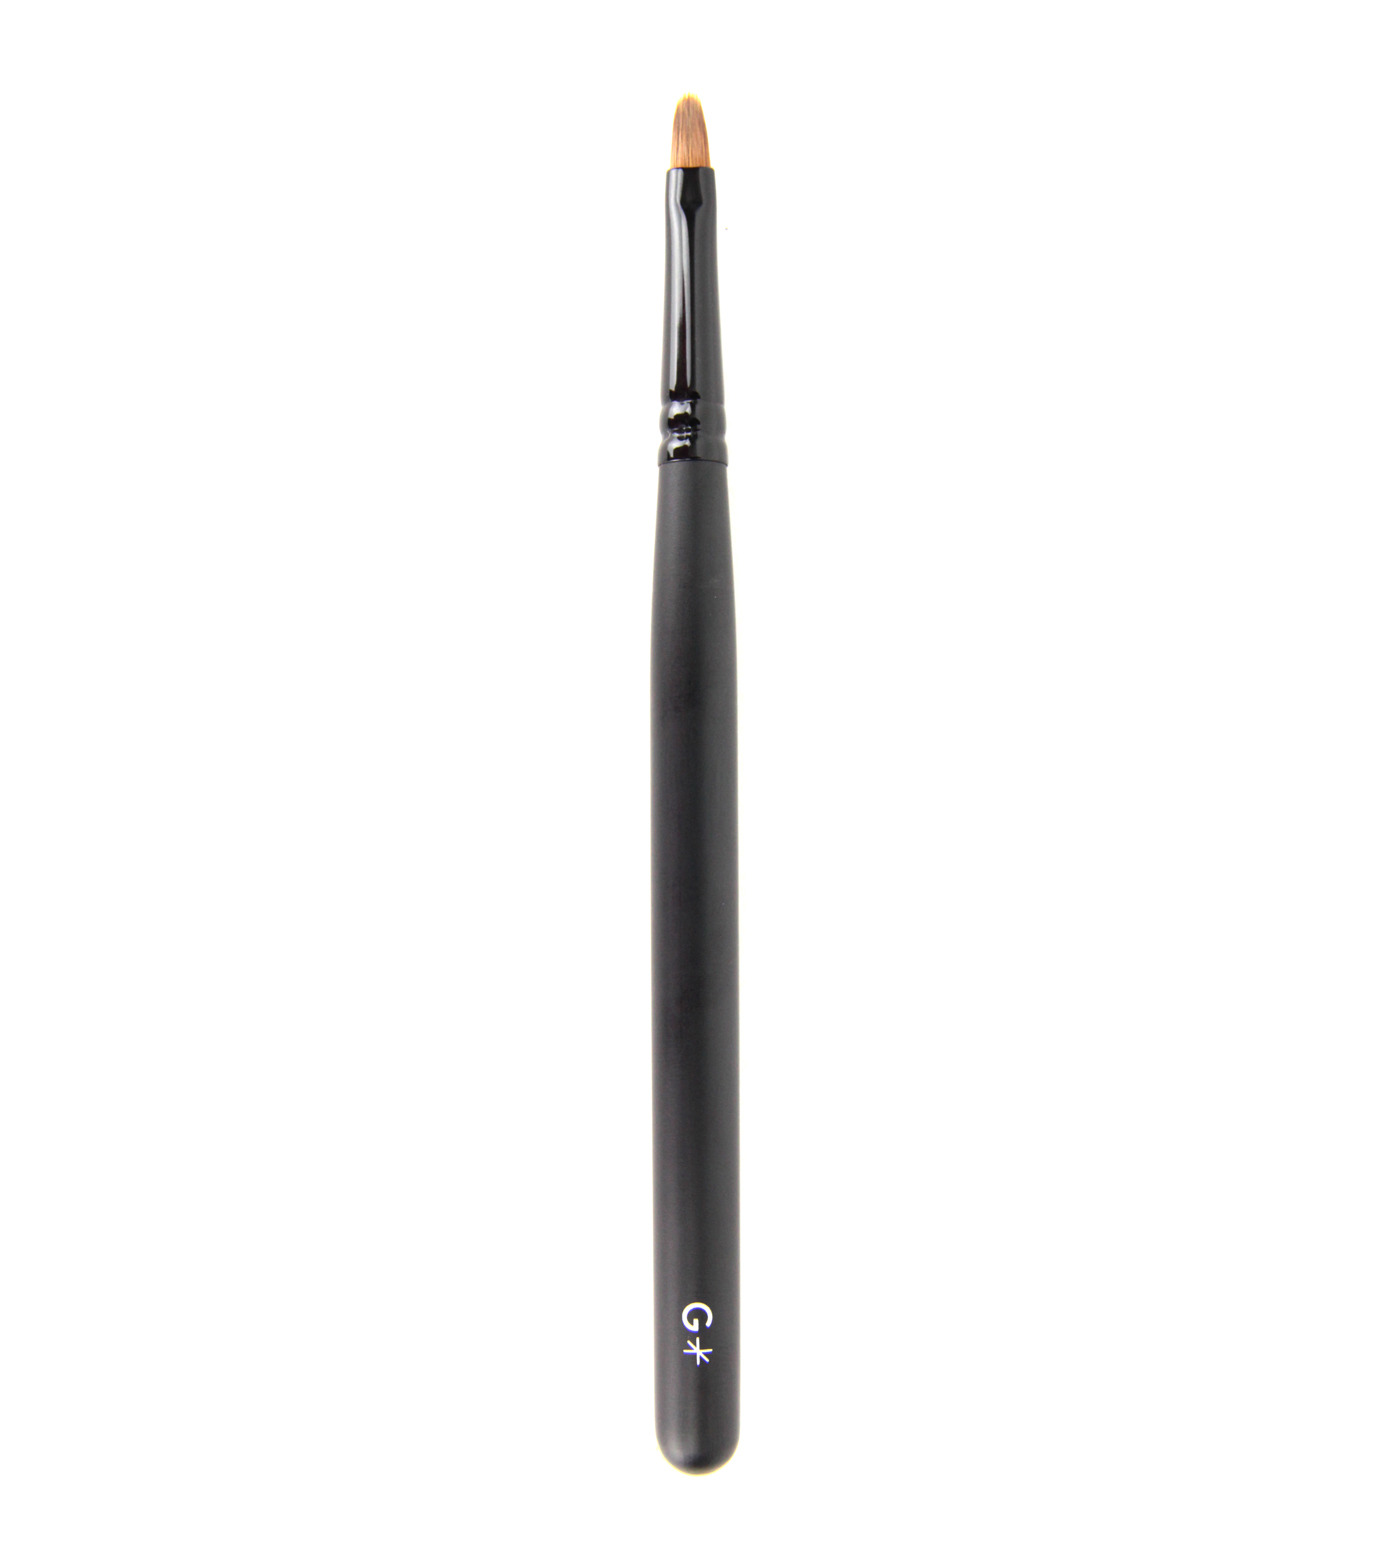 GRANJE(グランジェ)のGel Brush 1 Round-BLACK(MAKE-UP/MAKE-UP)-910-13 拡大詳細画像3